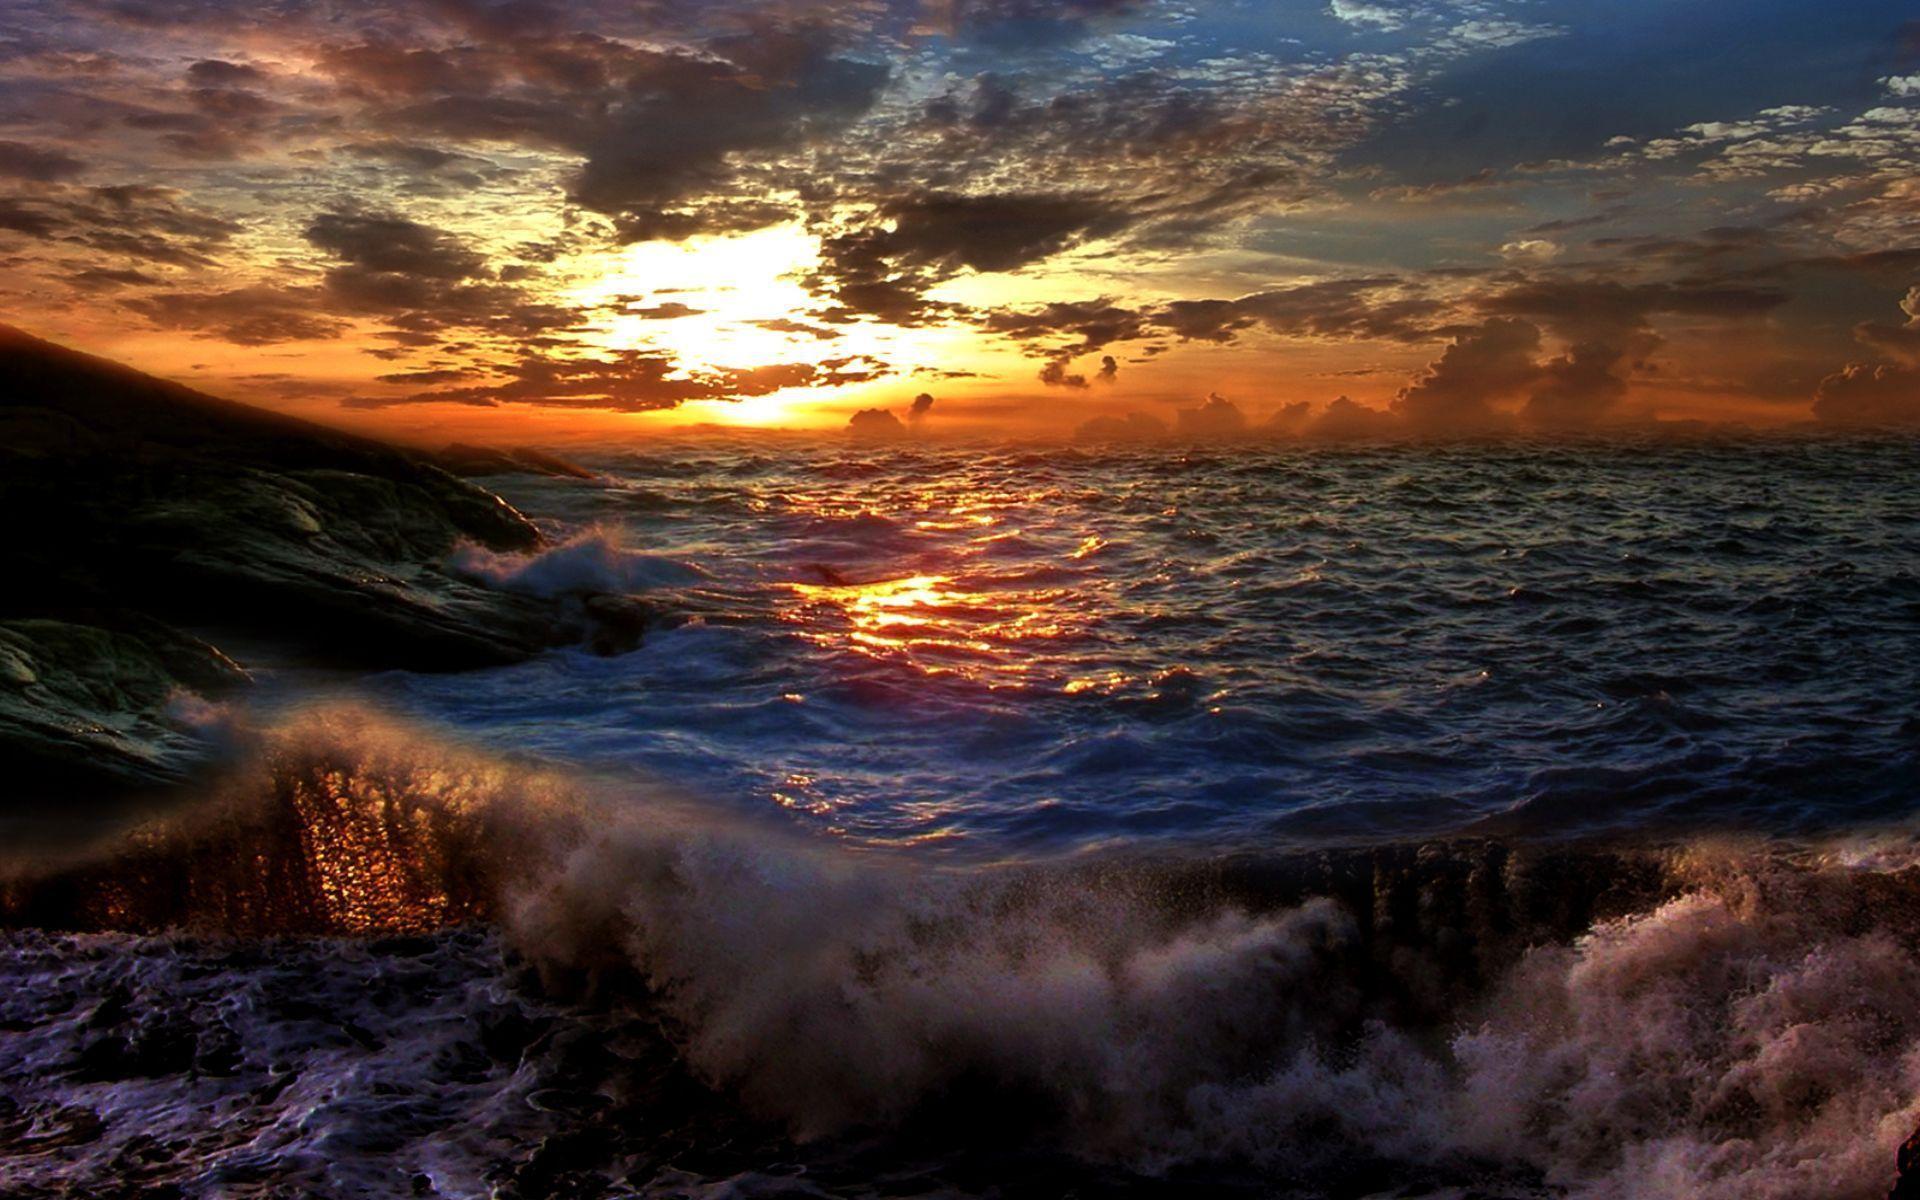 Hdr full hd wallpaper and background image 1920x1200 for Sfondi desktop tramonti mare